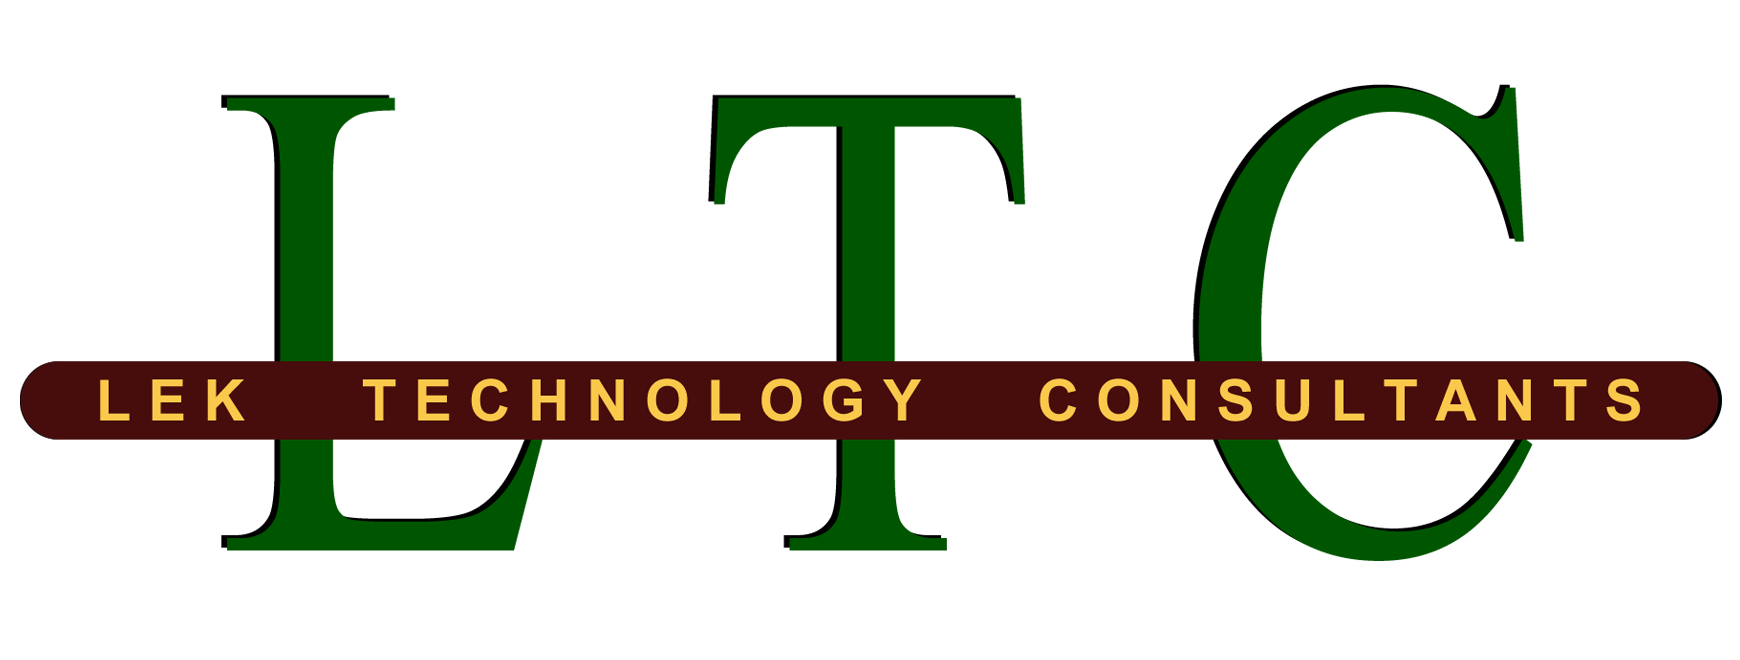 Lek Technology Consultants